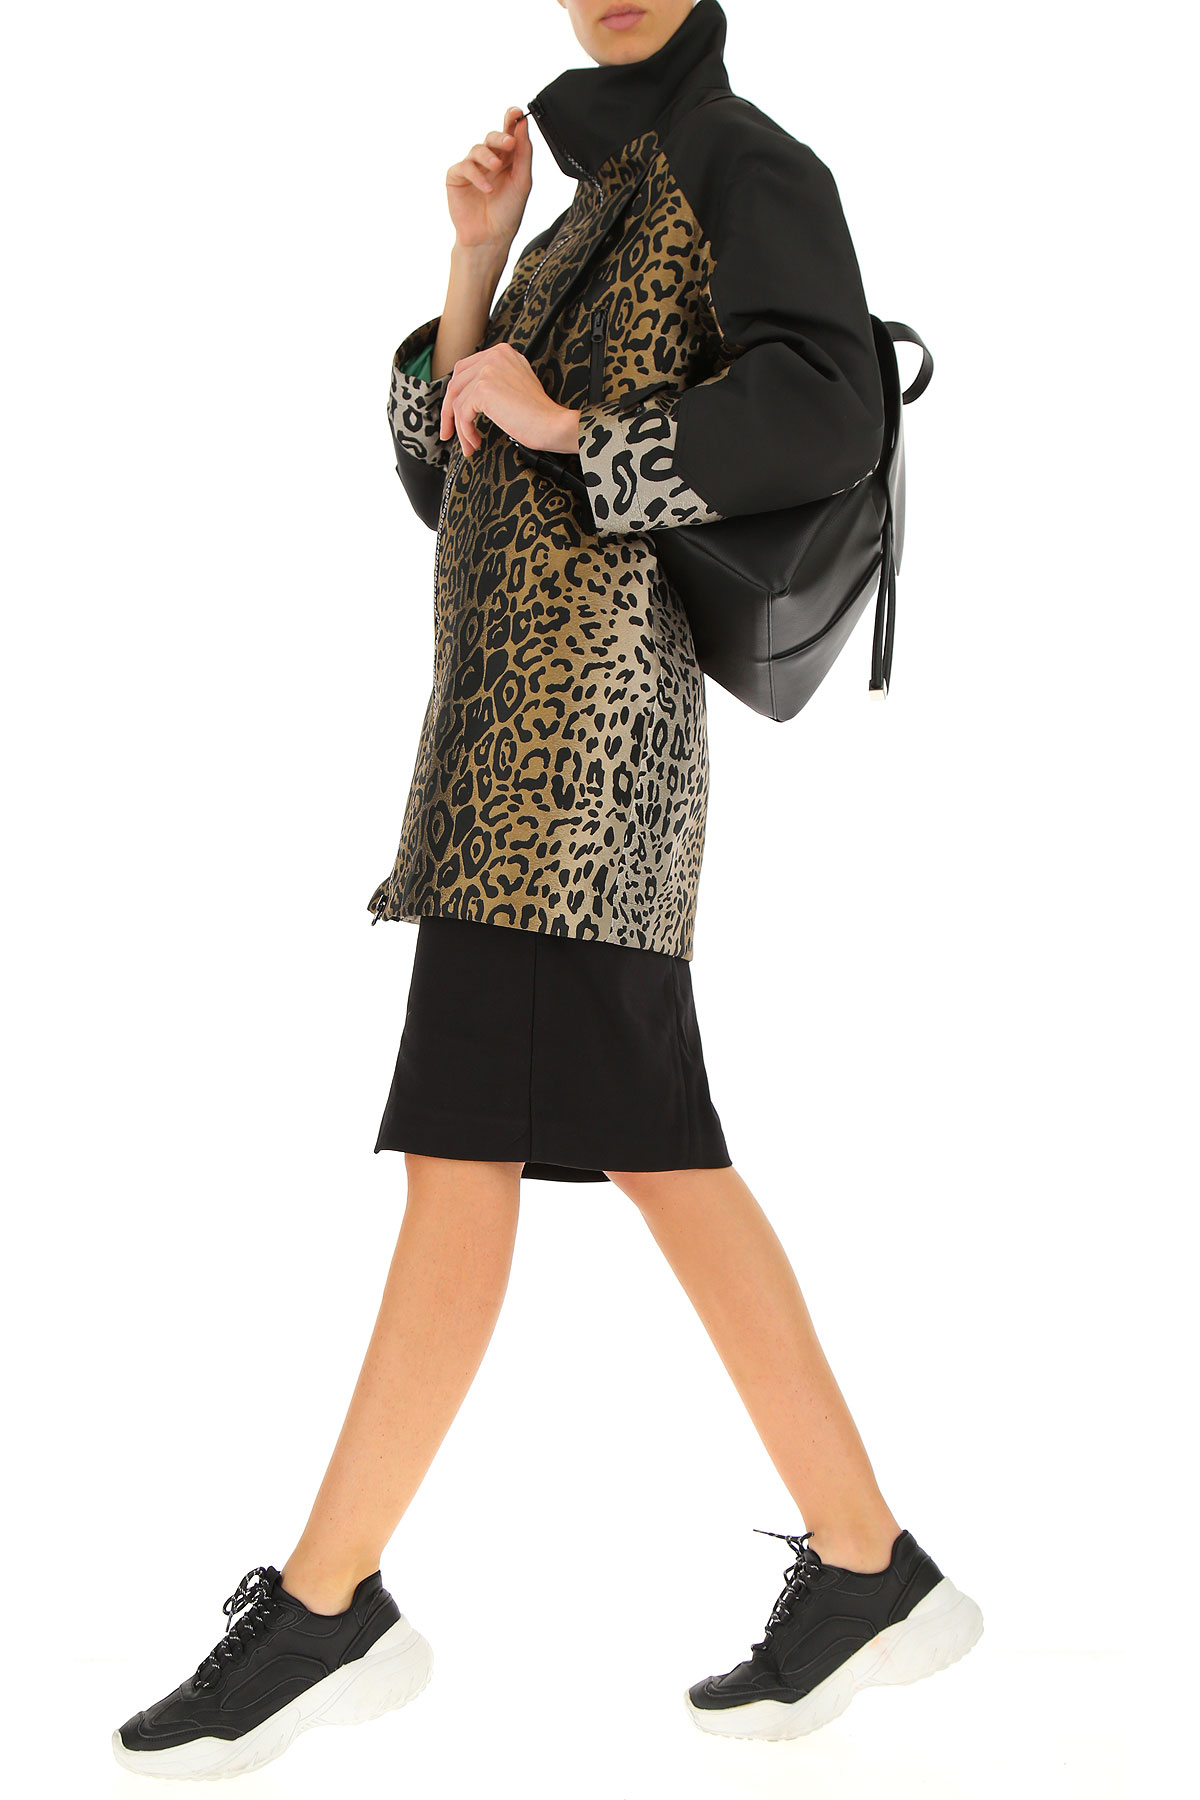 verano 2019 Pinko Ropa Para Mujer Primavera Leopardo Negro qwSIXZ